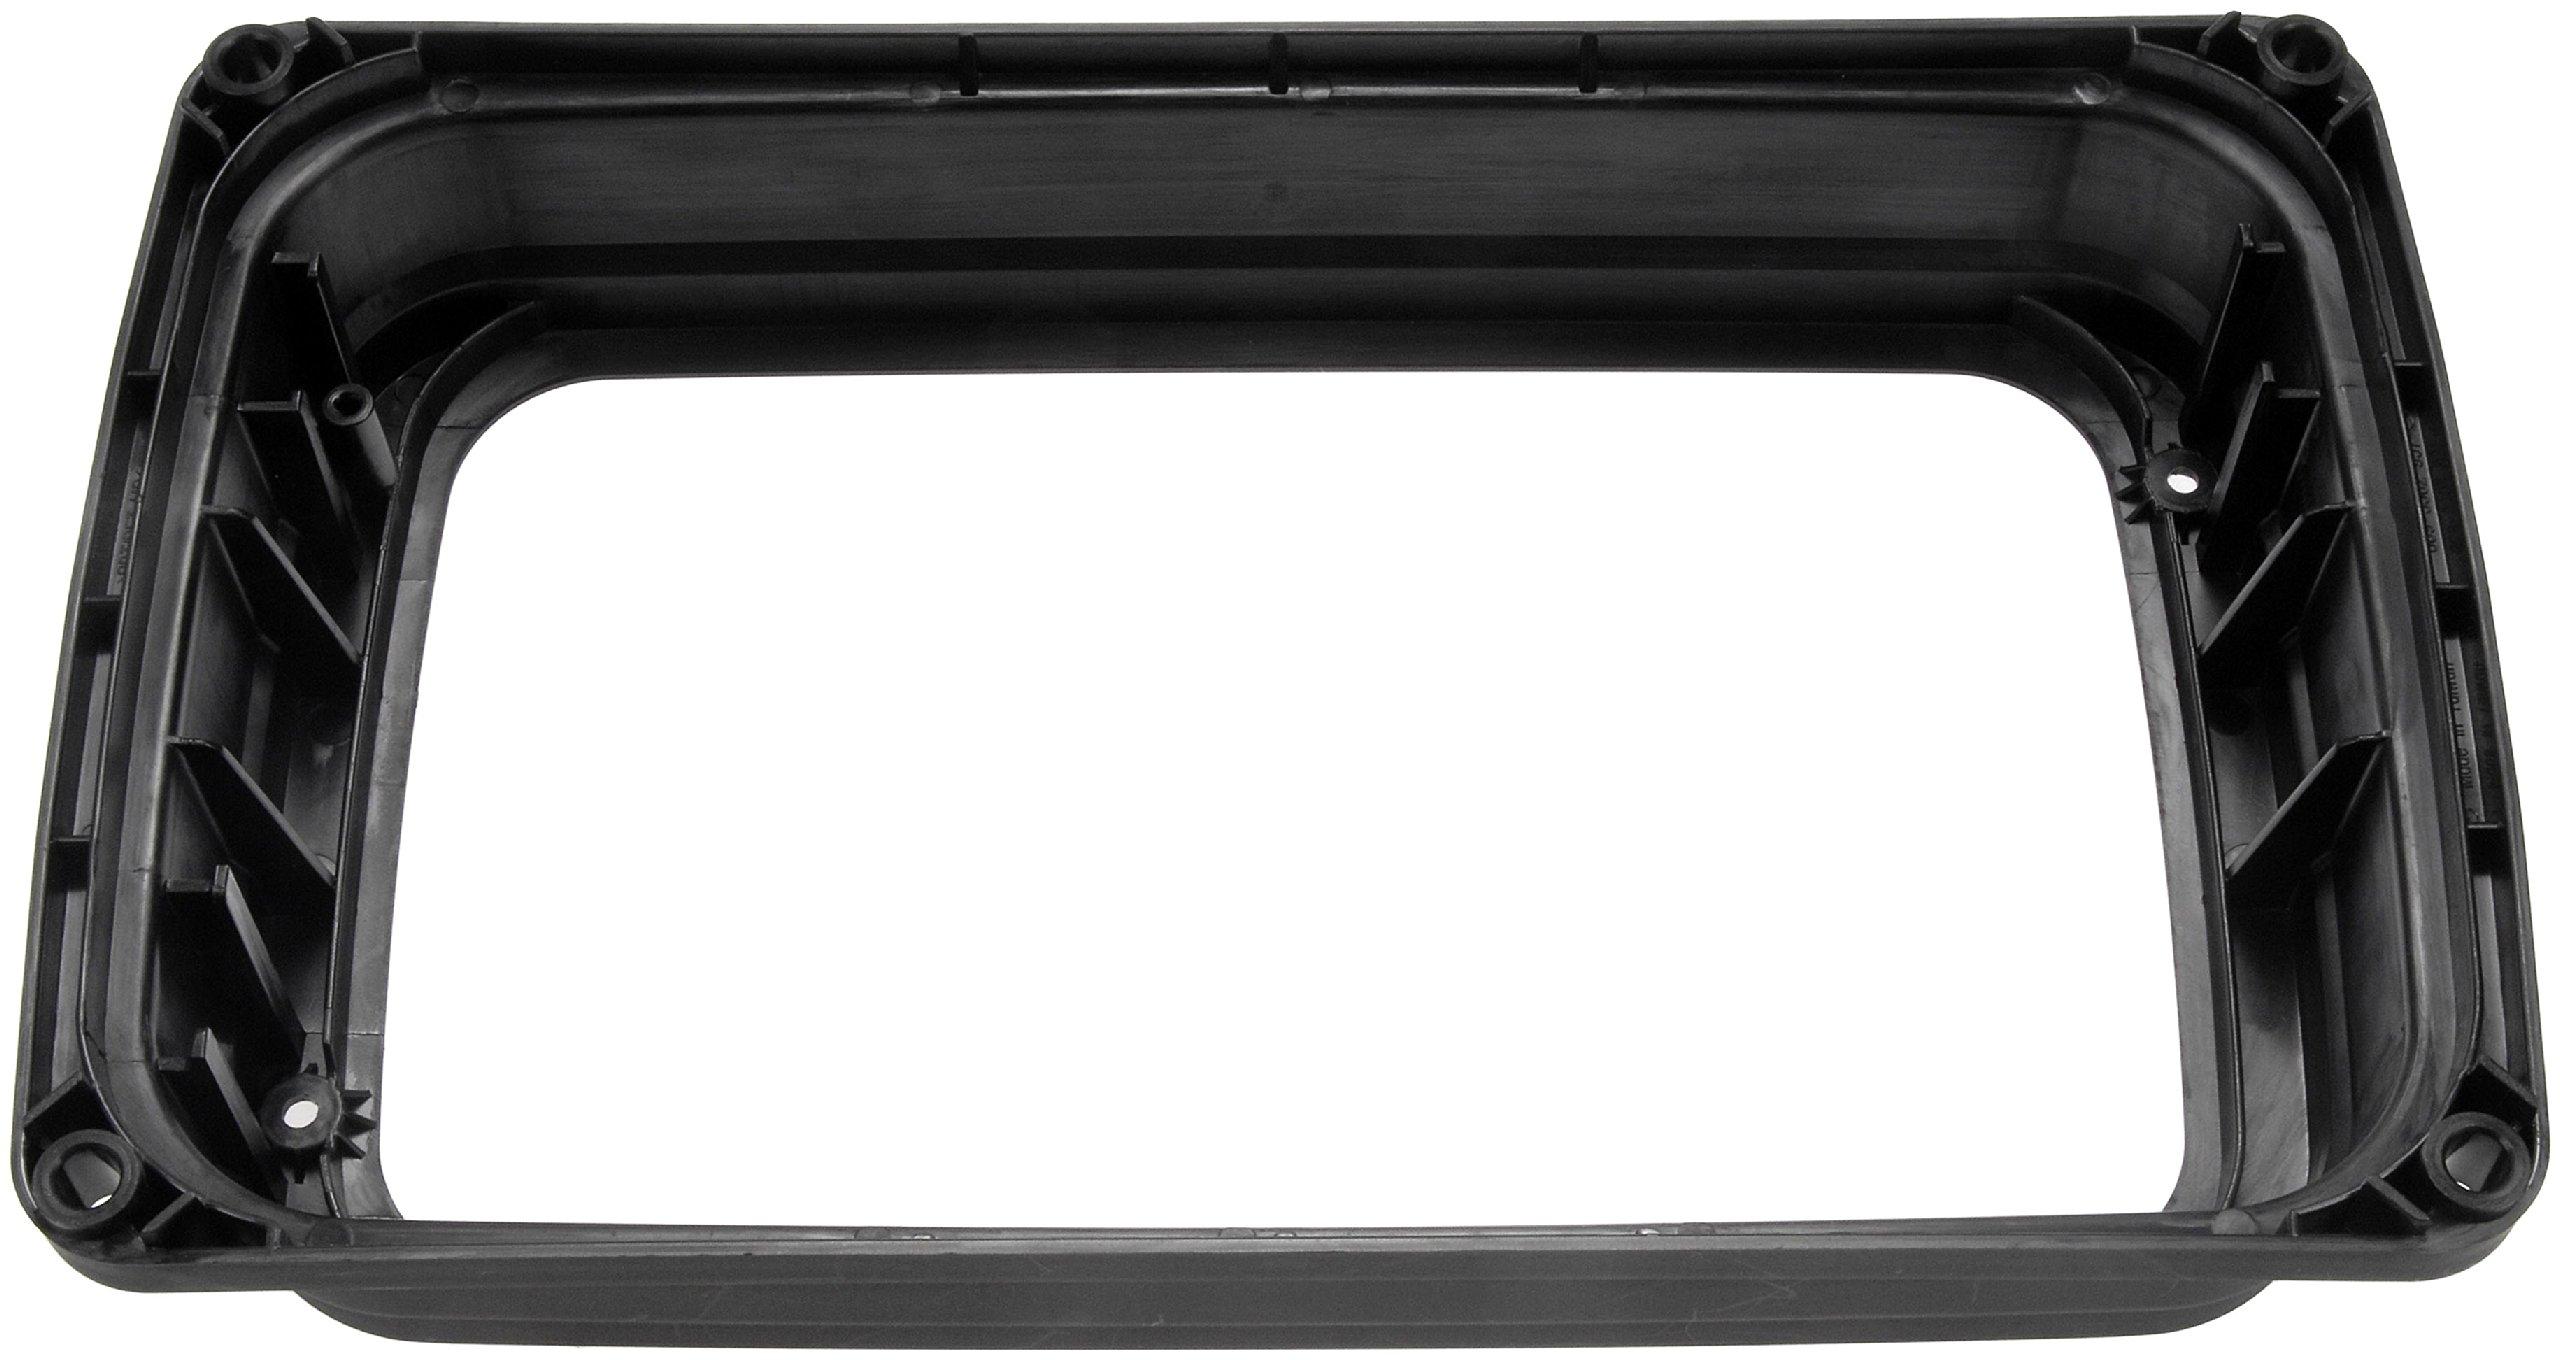 Dorman 889-5502 Mack Headlight Bezel by Dorman